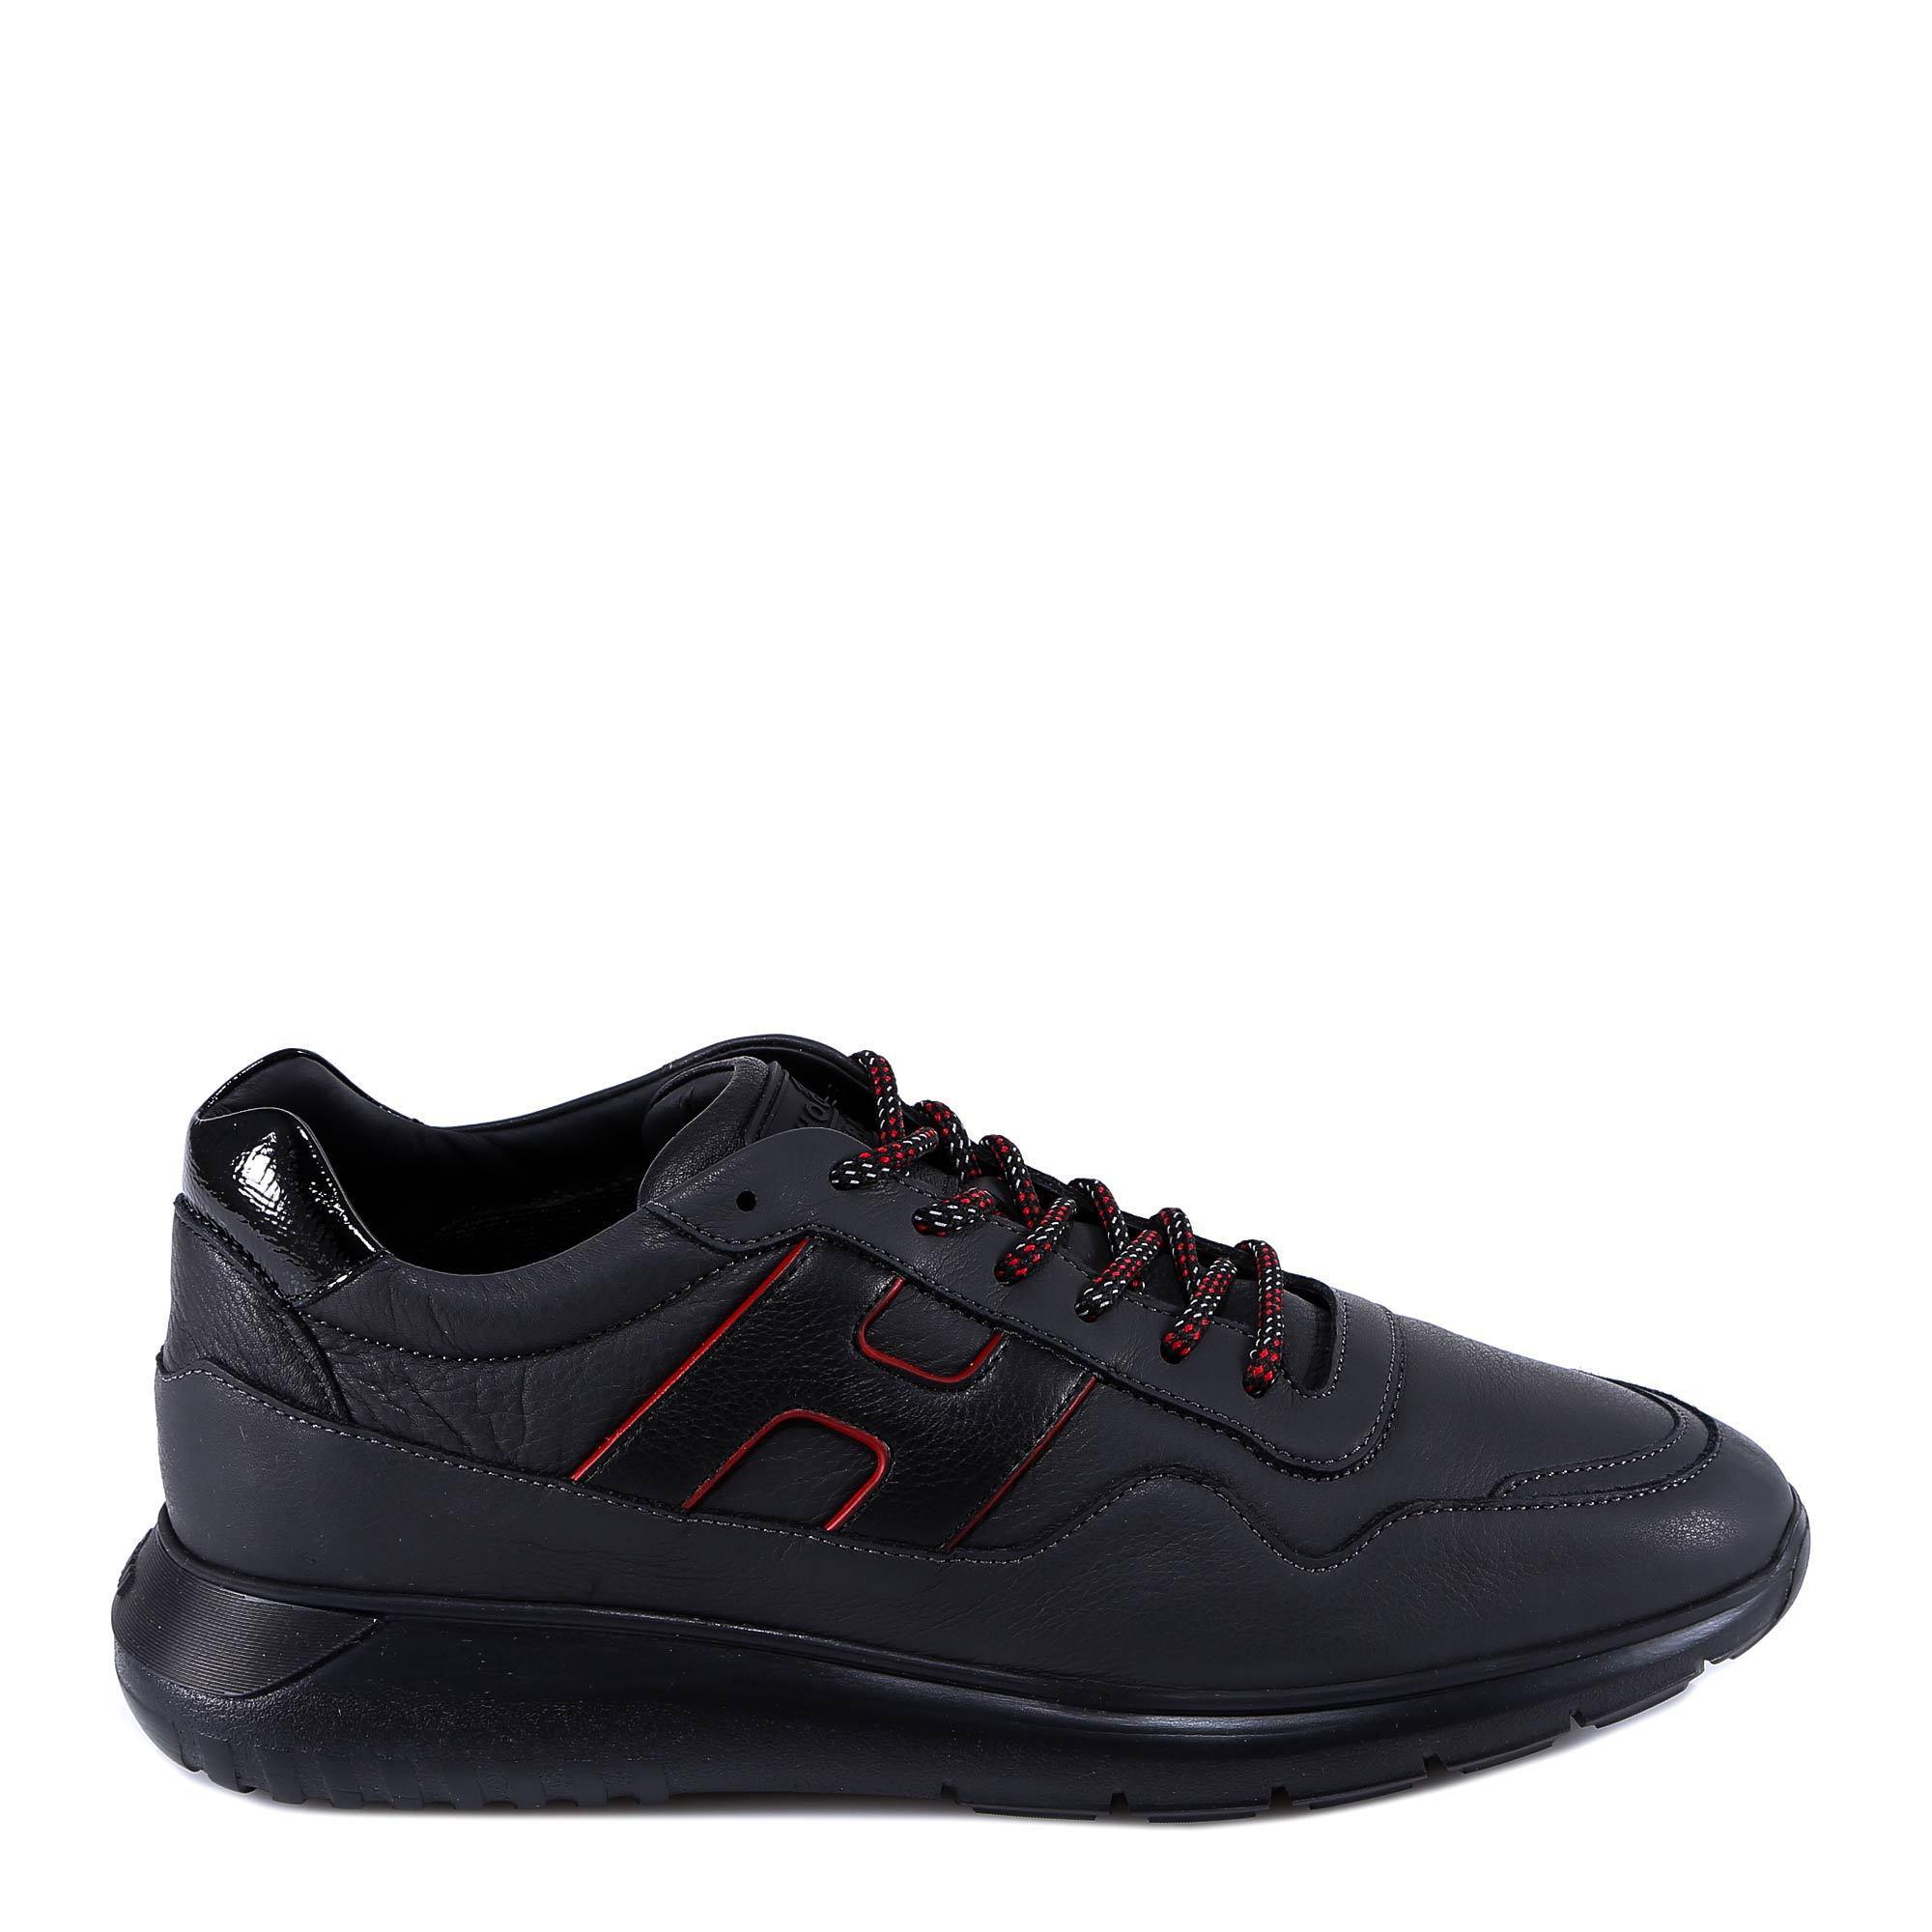 ad25ff9b206 Hogan Interactive 3 Sneakers in Black for Men - Lyst